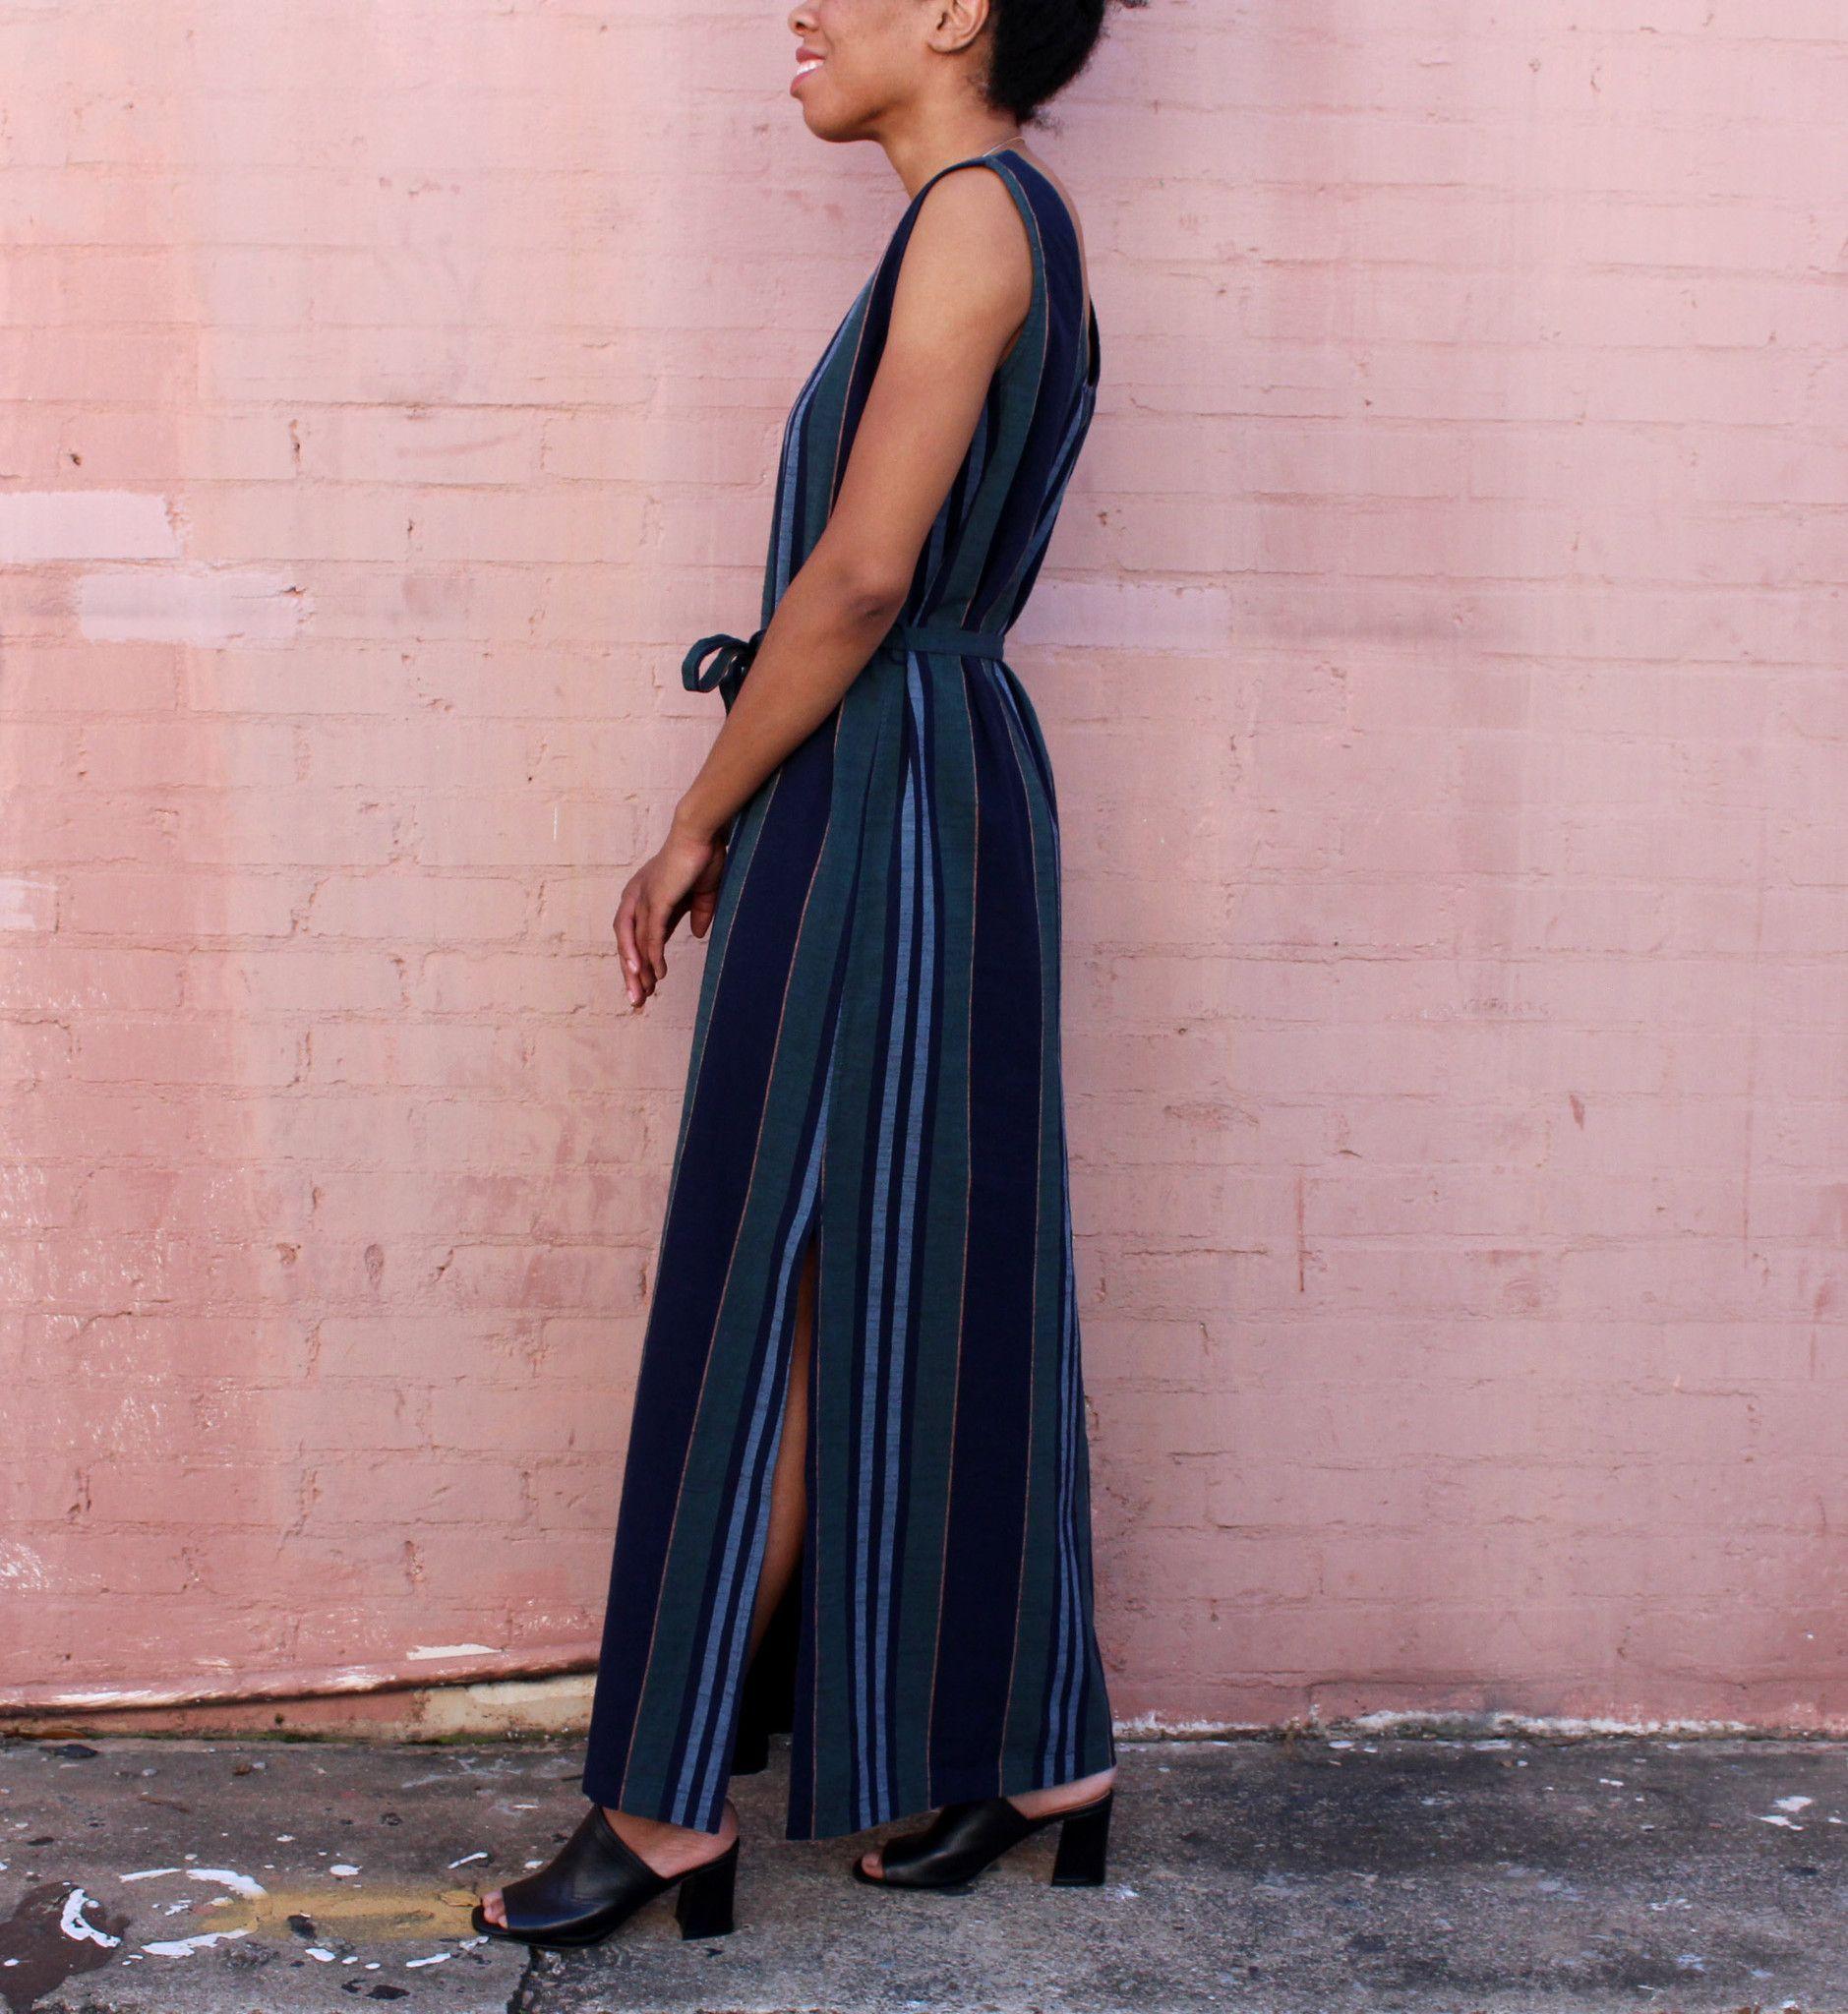 Ace & Jig Major Slipper Dress | Maxi dress cotton, Dresses